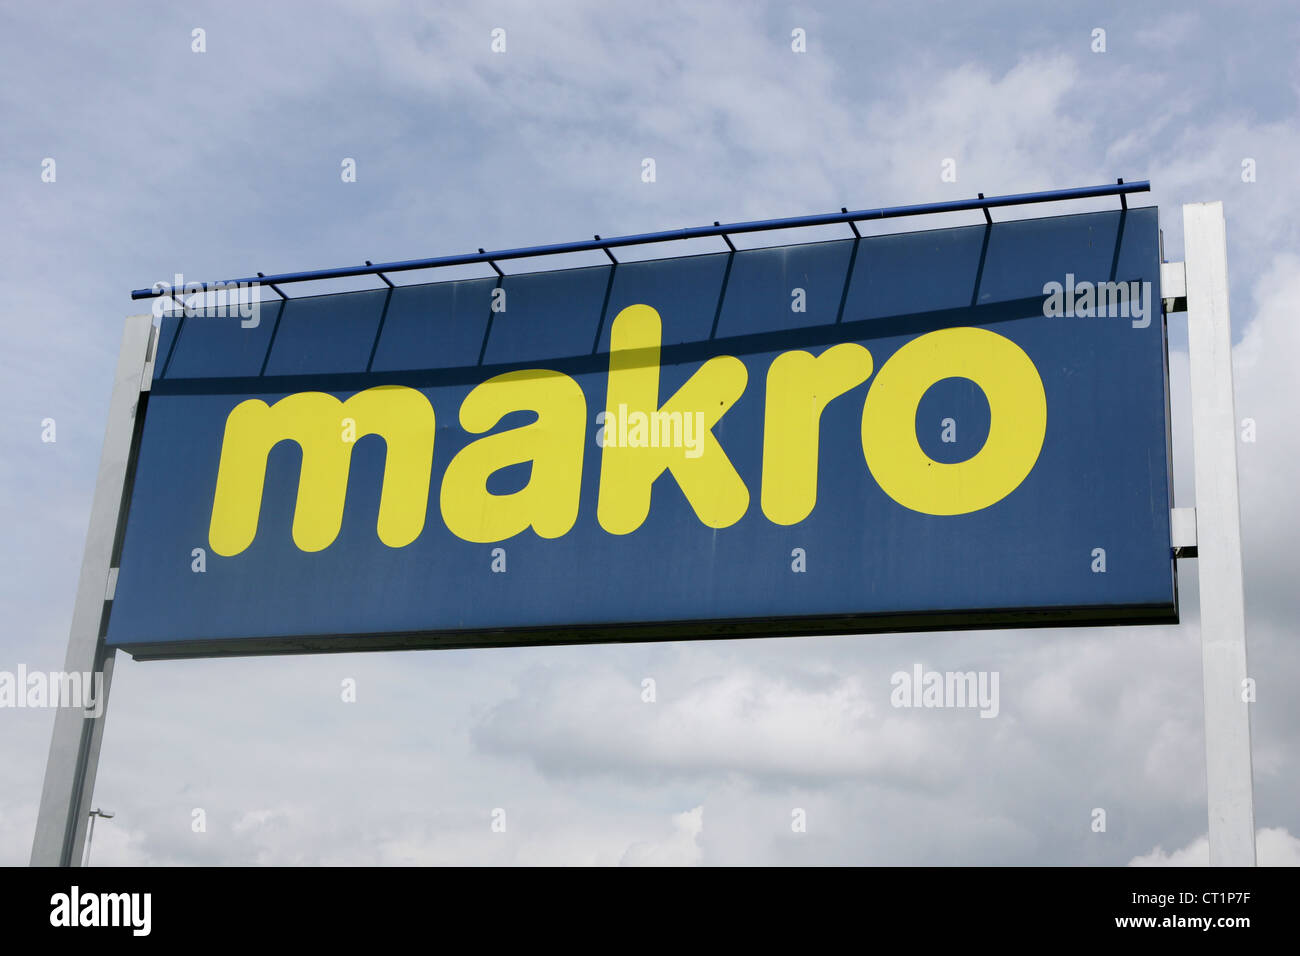 makro - wholesale store in birmingham uk - Stock Image